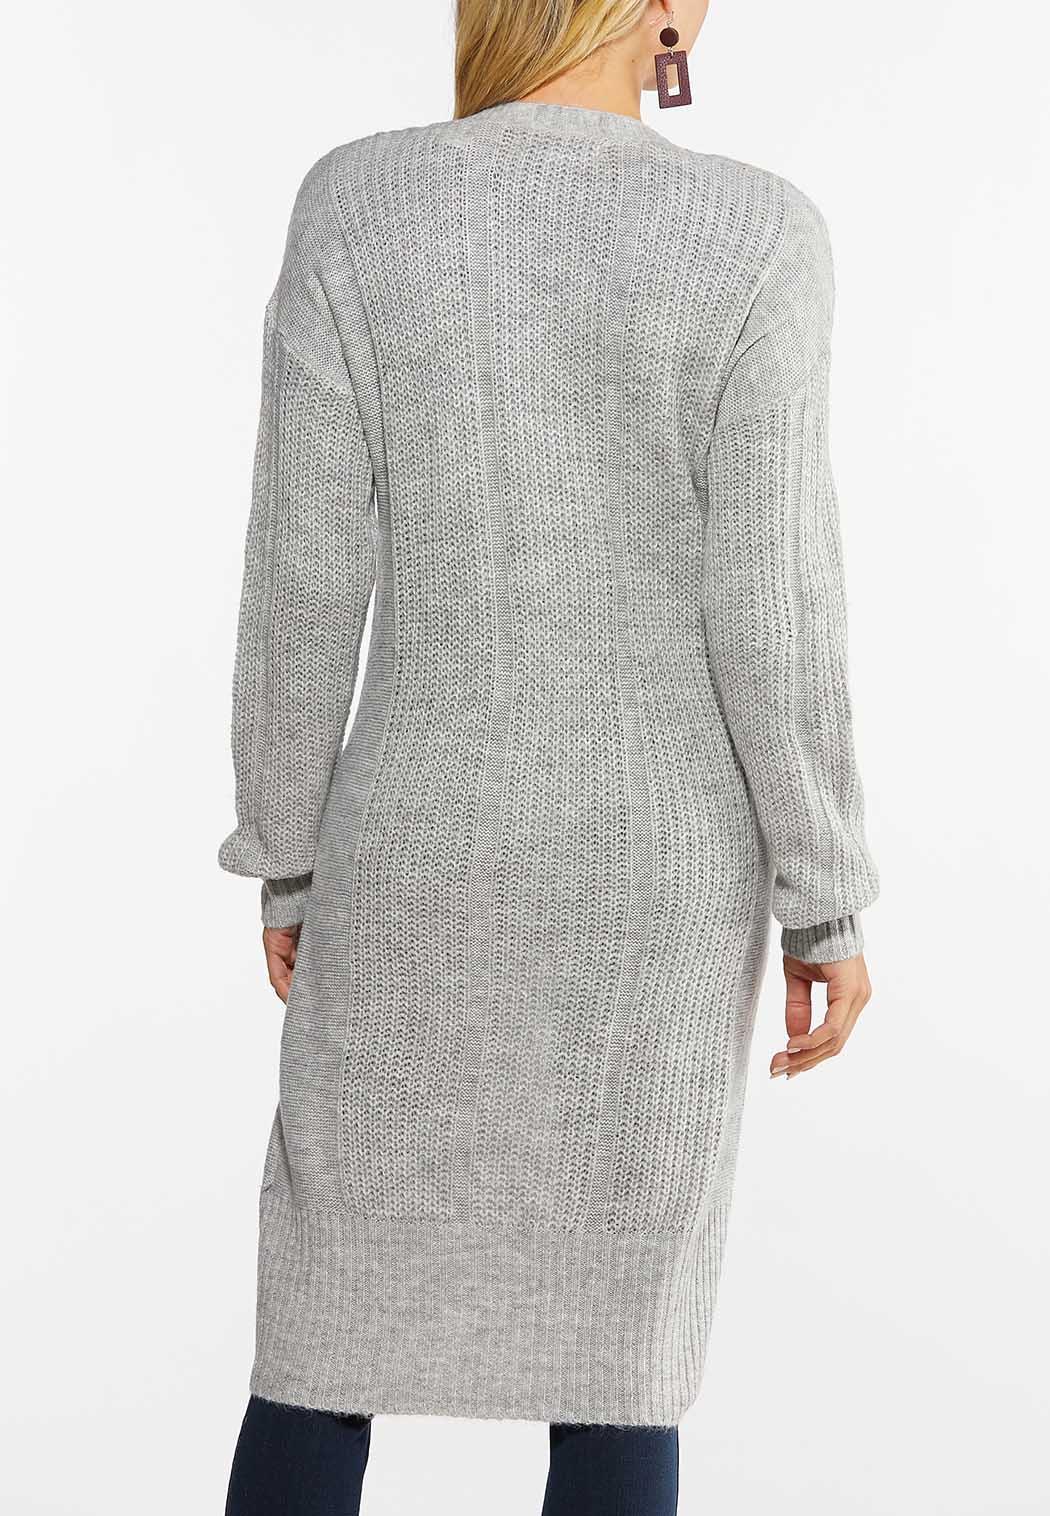 Gray Cardigan Sweater (Item #44430961)